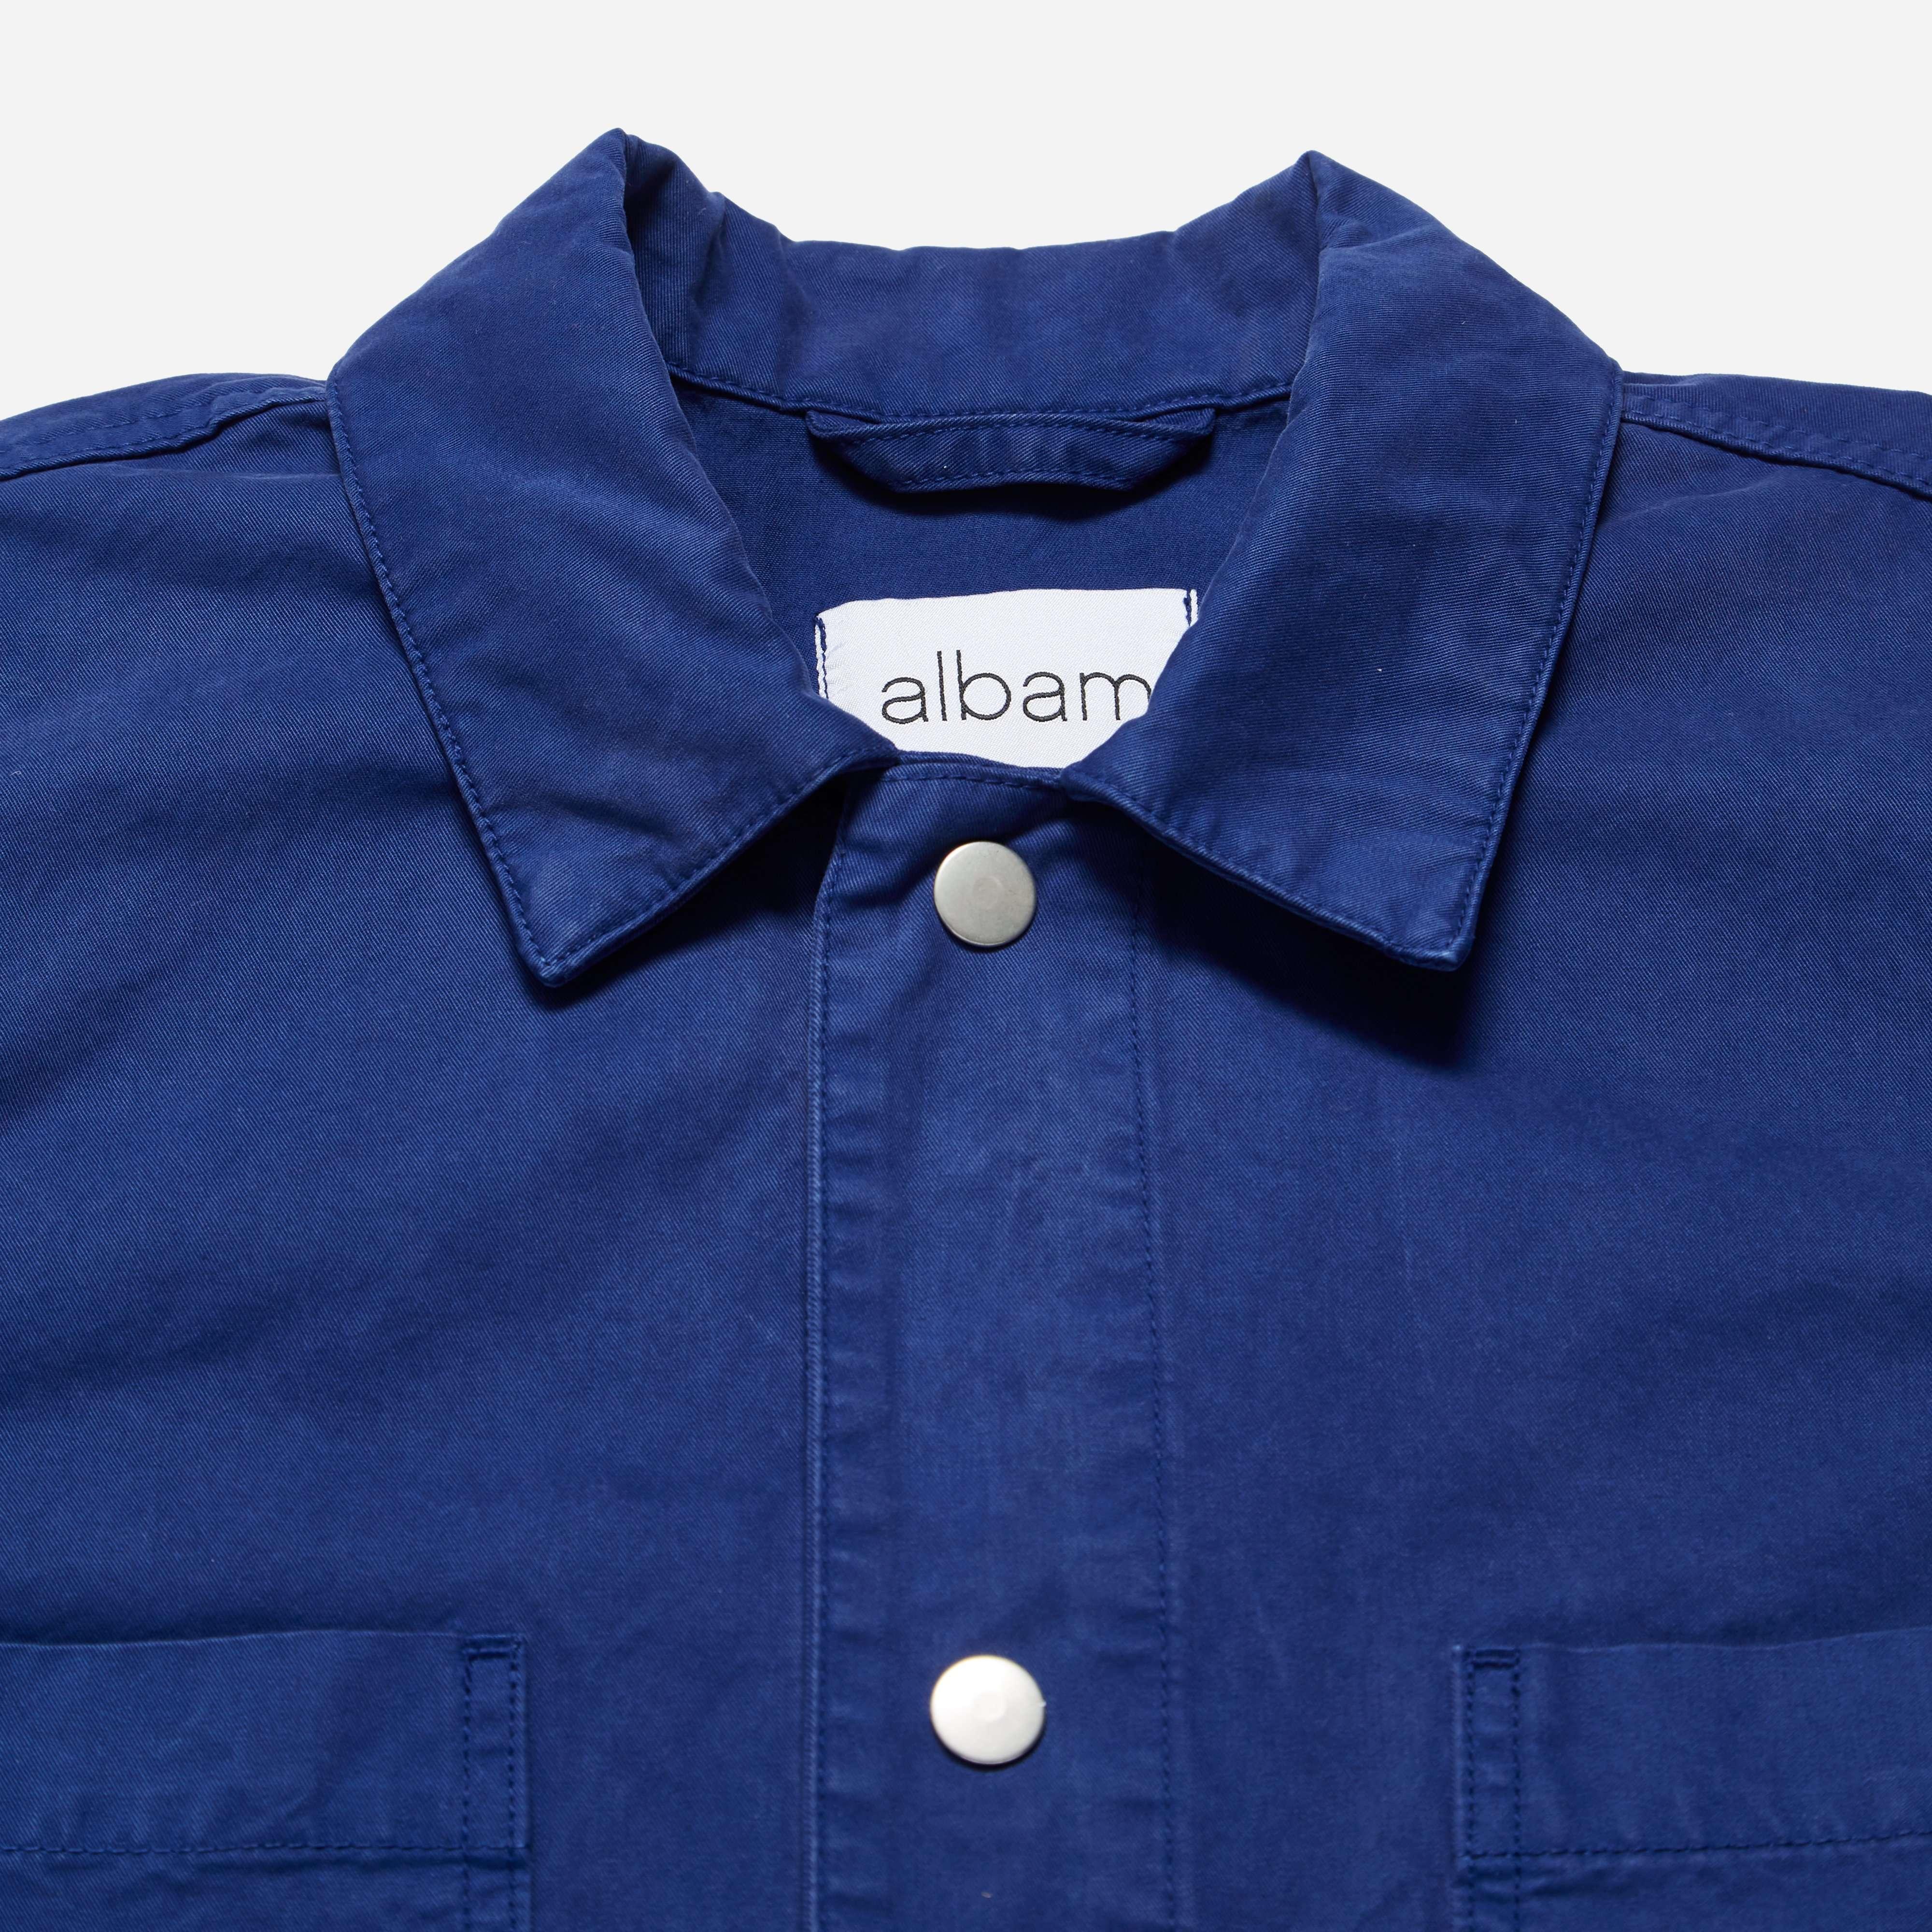 Albam Work Jacket